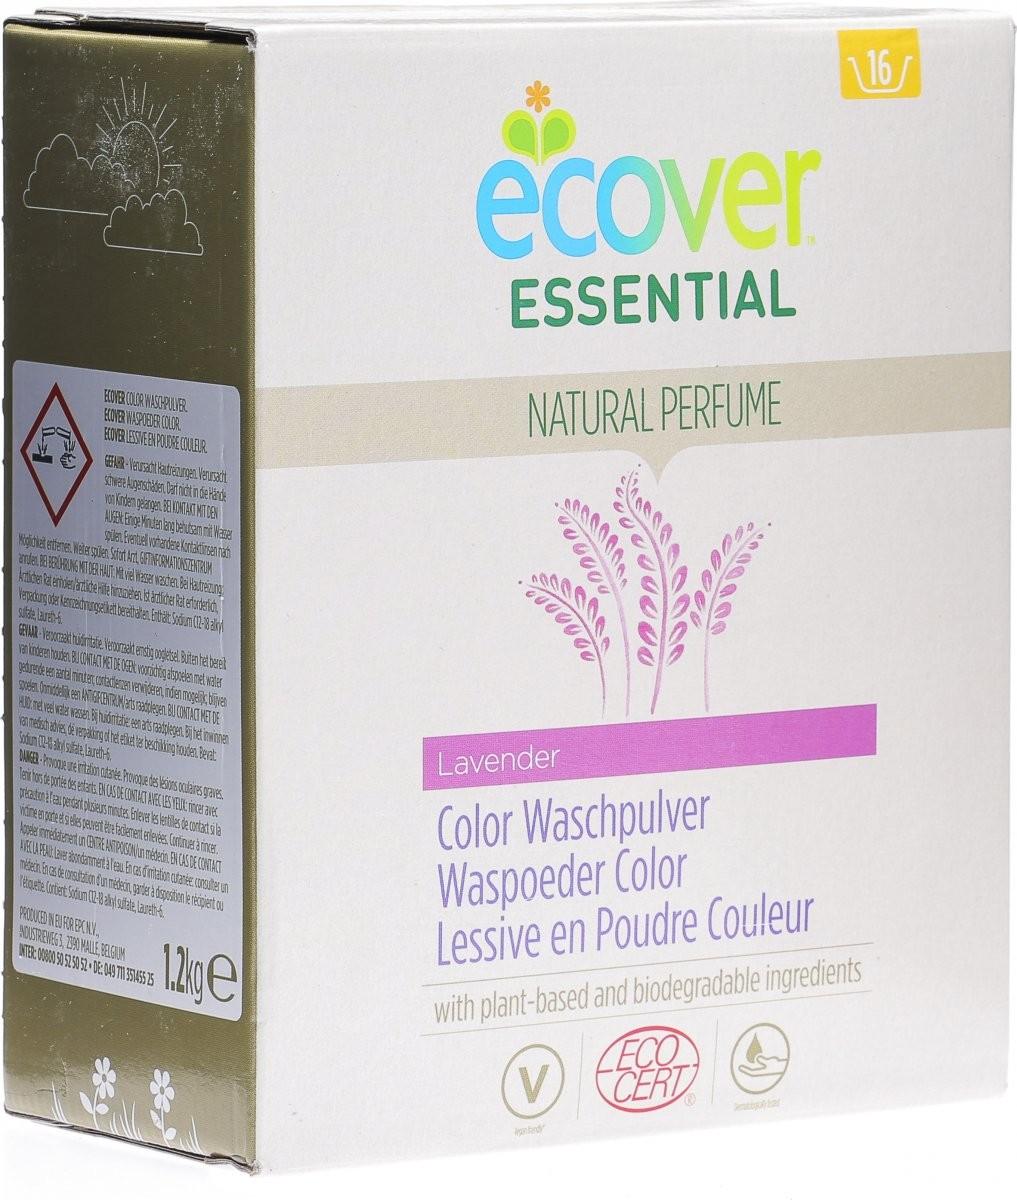 Image of Ecover Essential Color Waschpulver Lavendel (1.2kg)